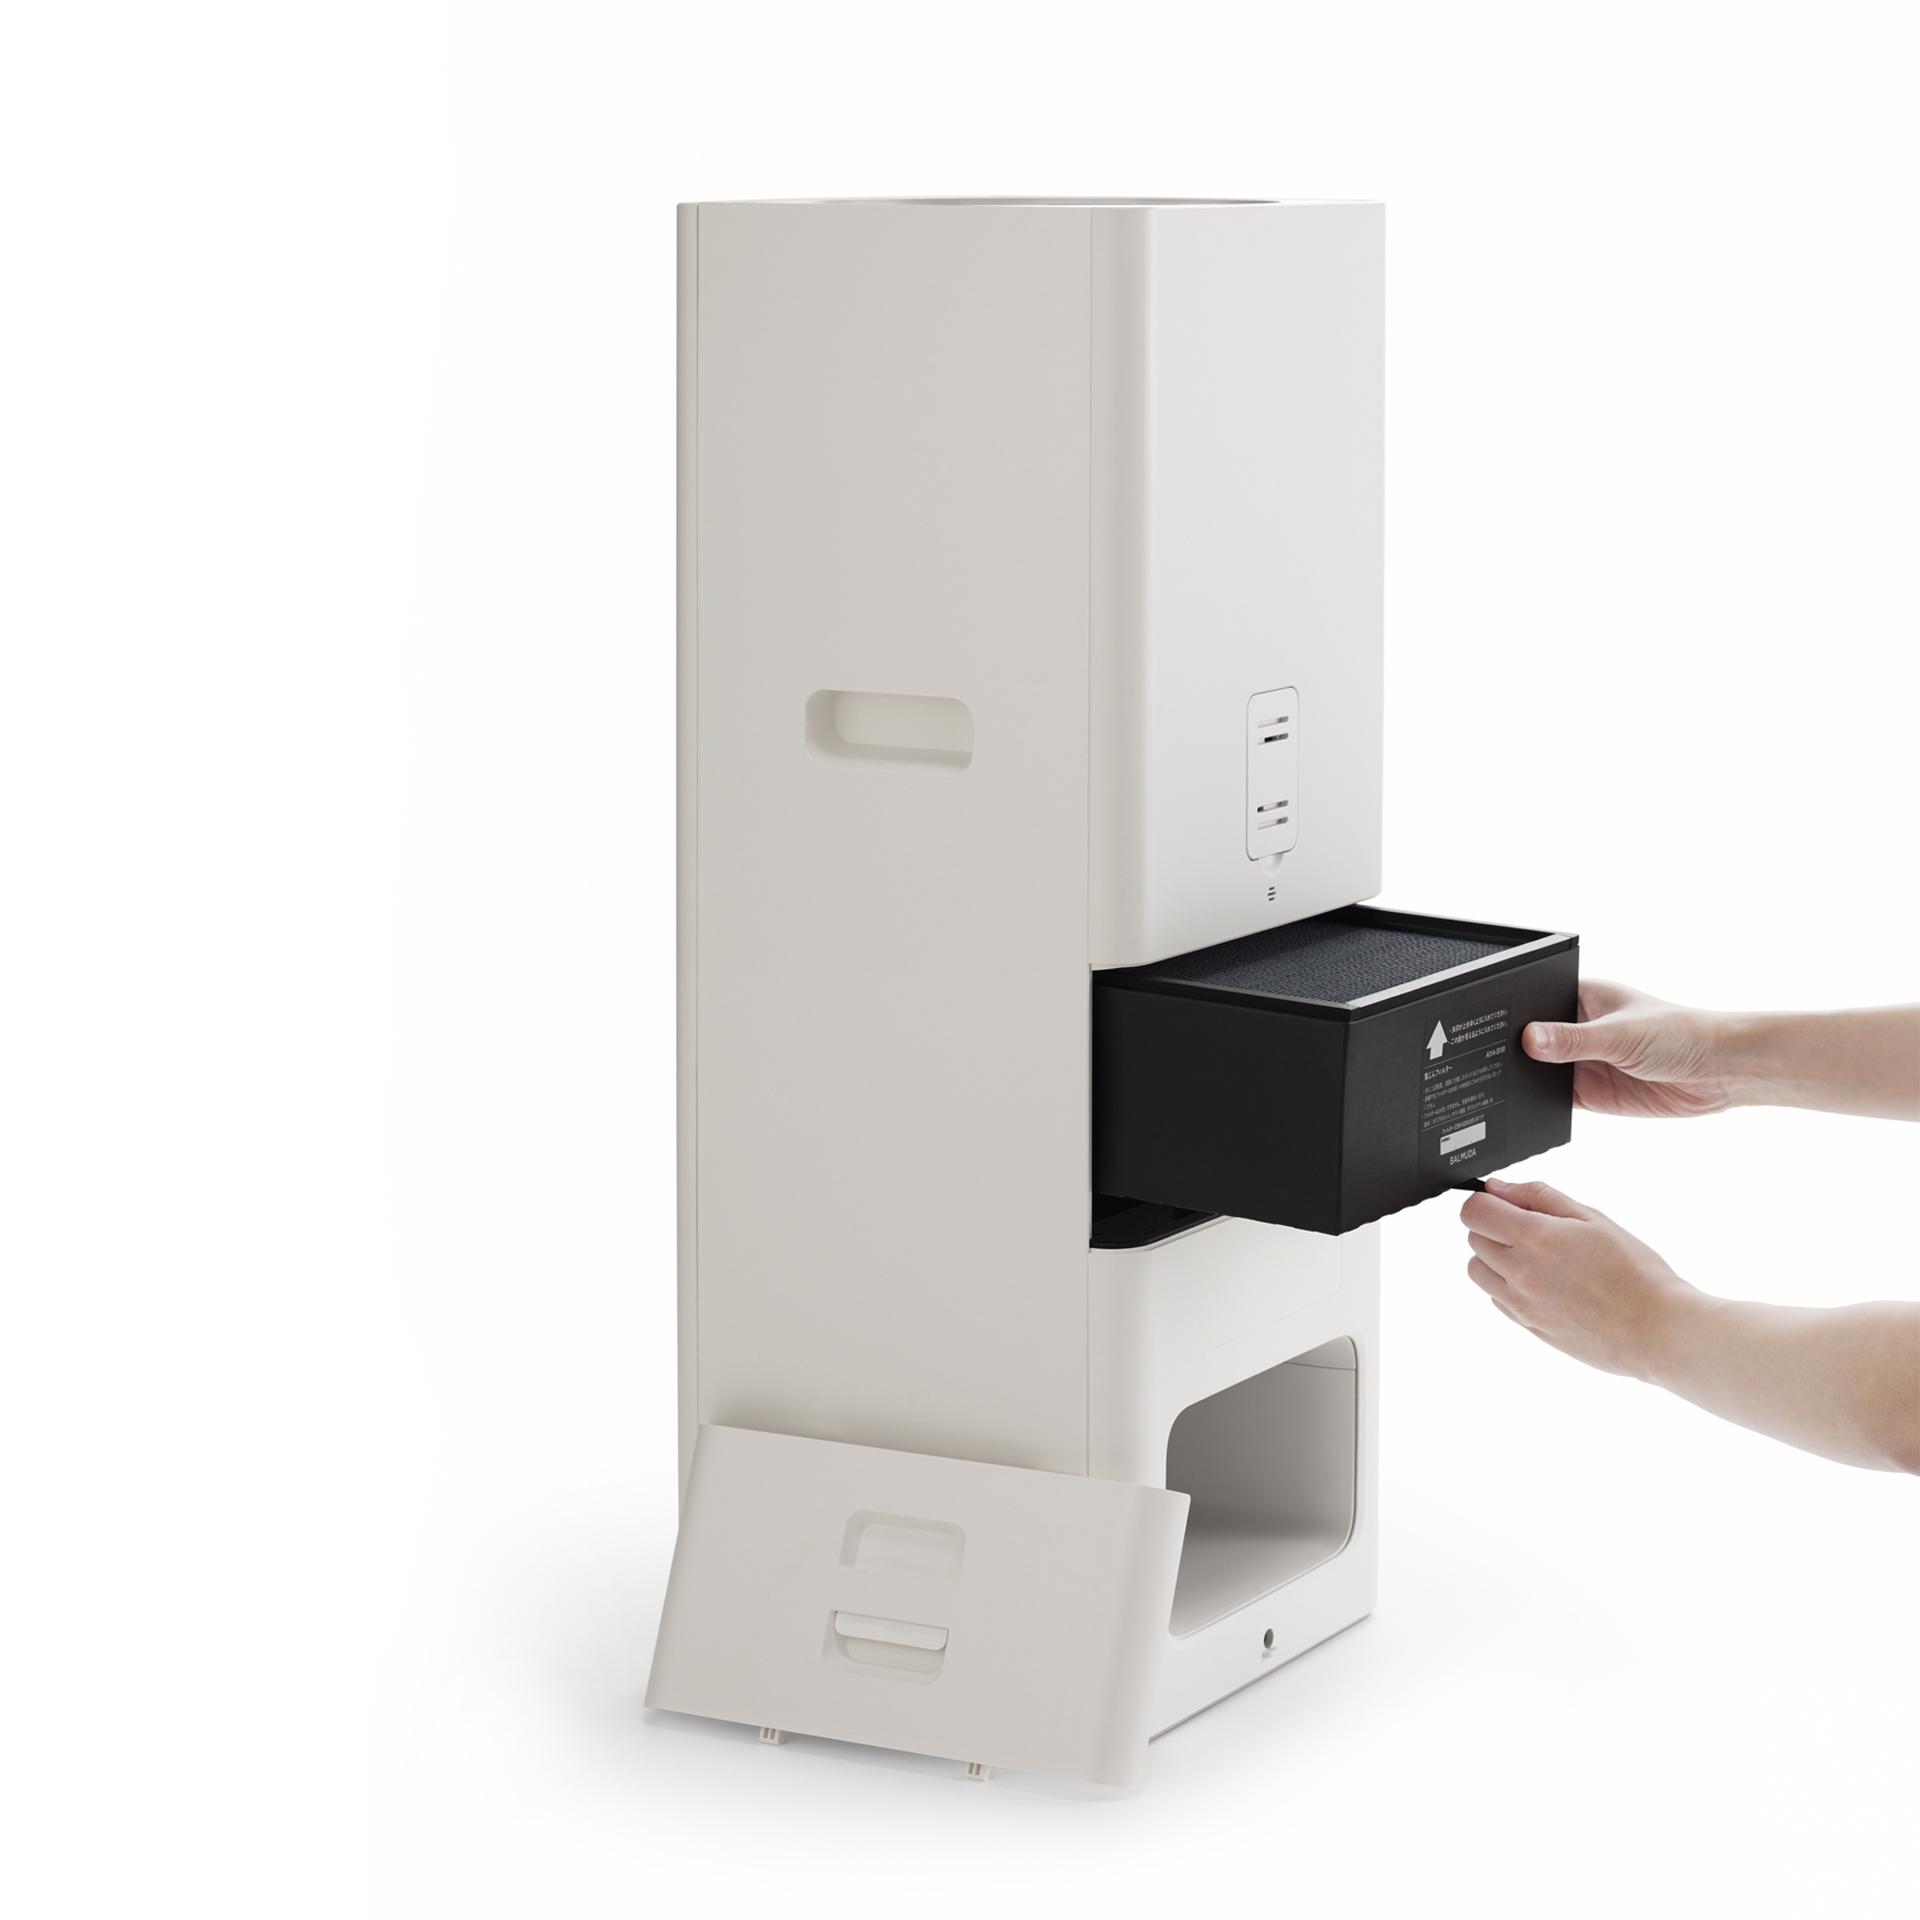 EJT-S200 集塵・除臭濾網組